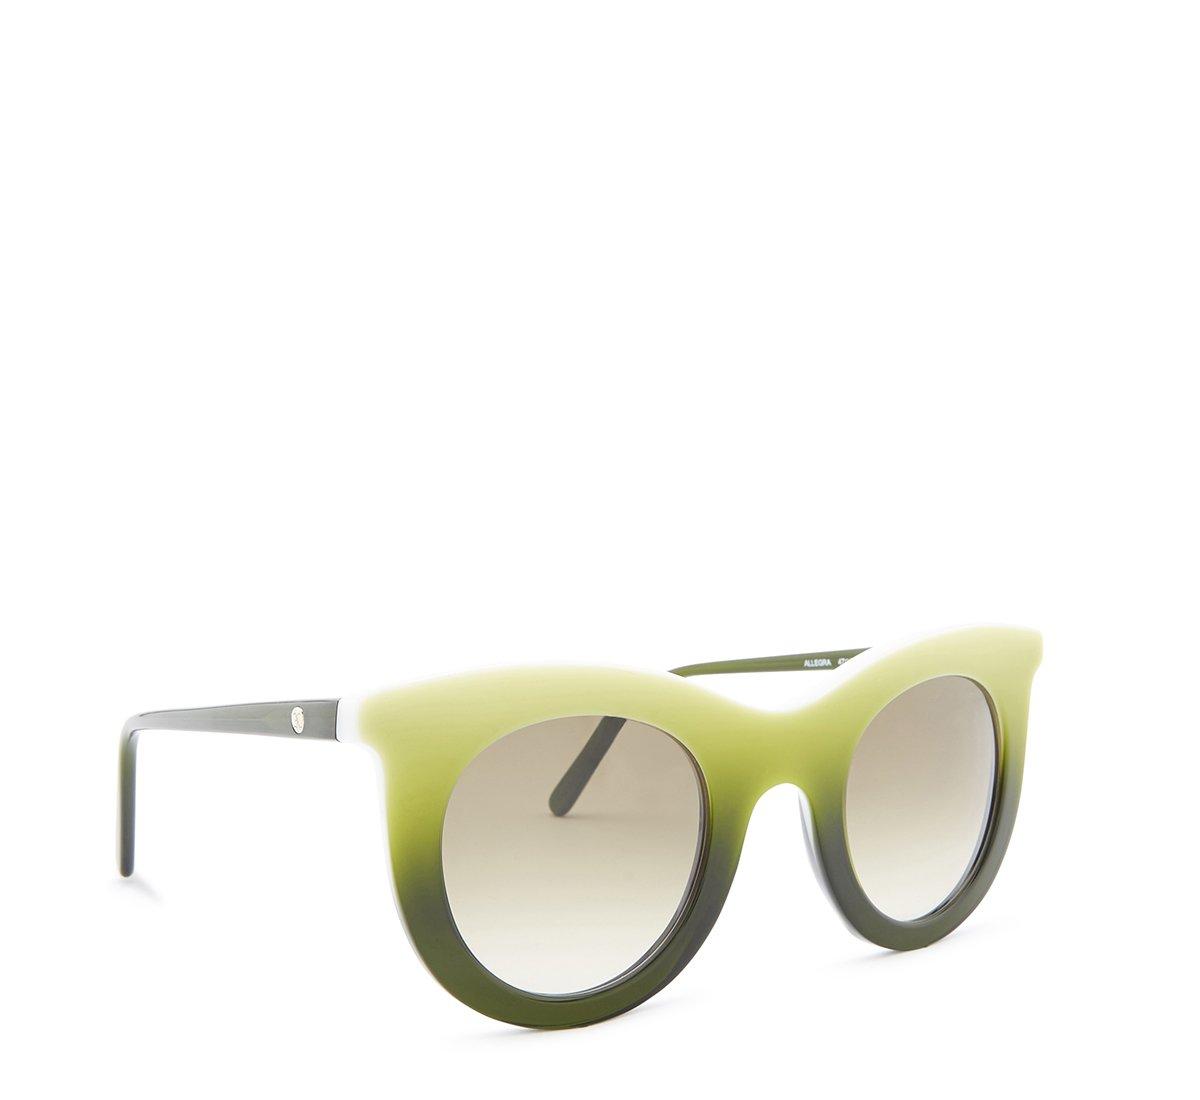 Occhiale Allegra verde